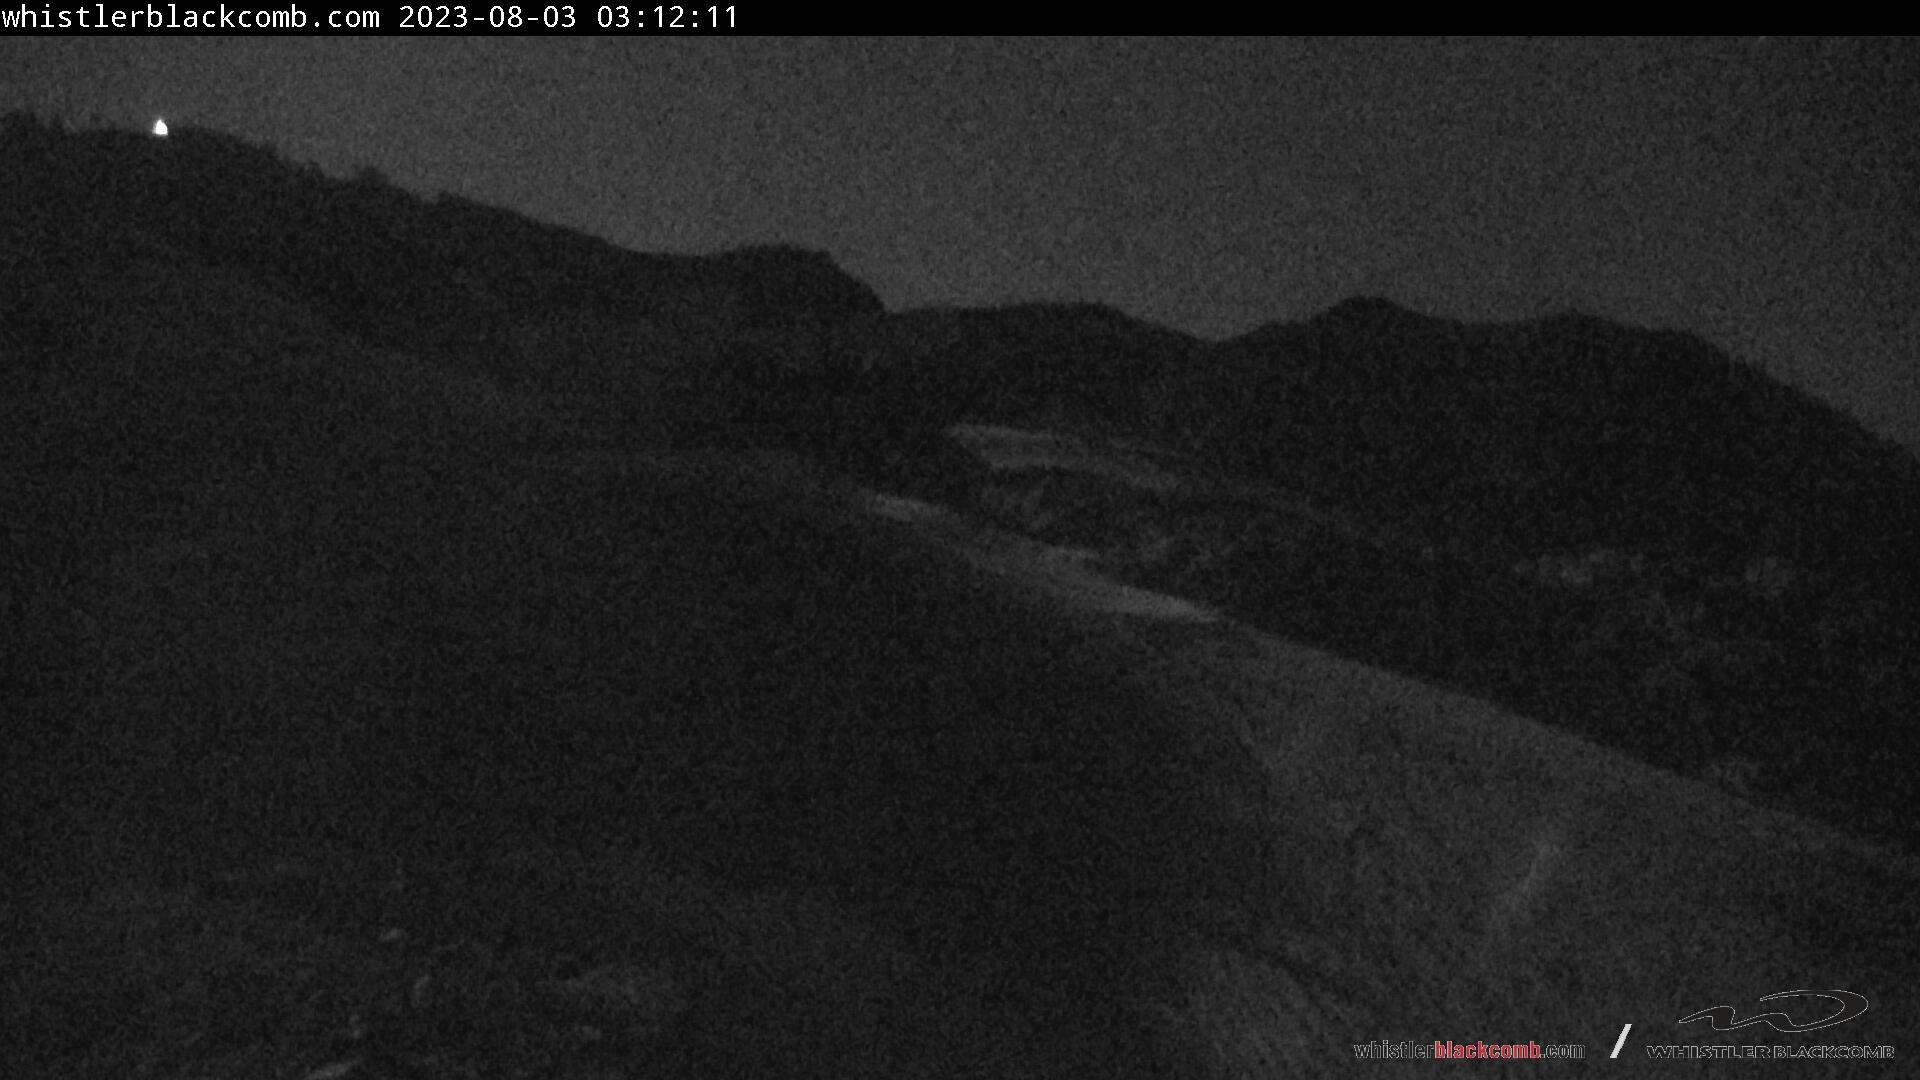 Whistler Blackcomb, Horstman Glacier - Top